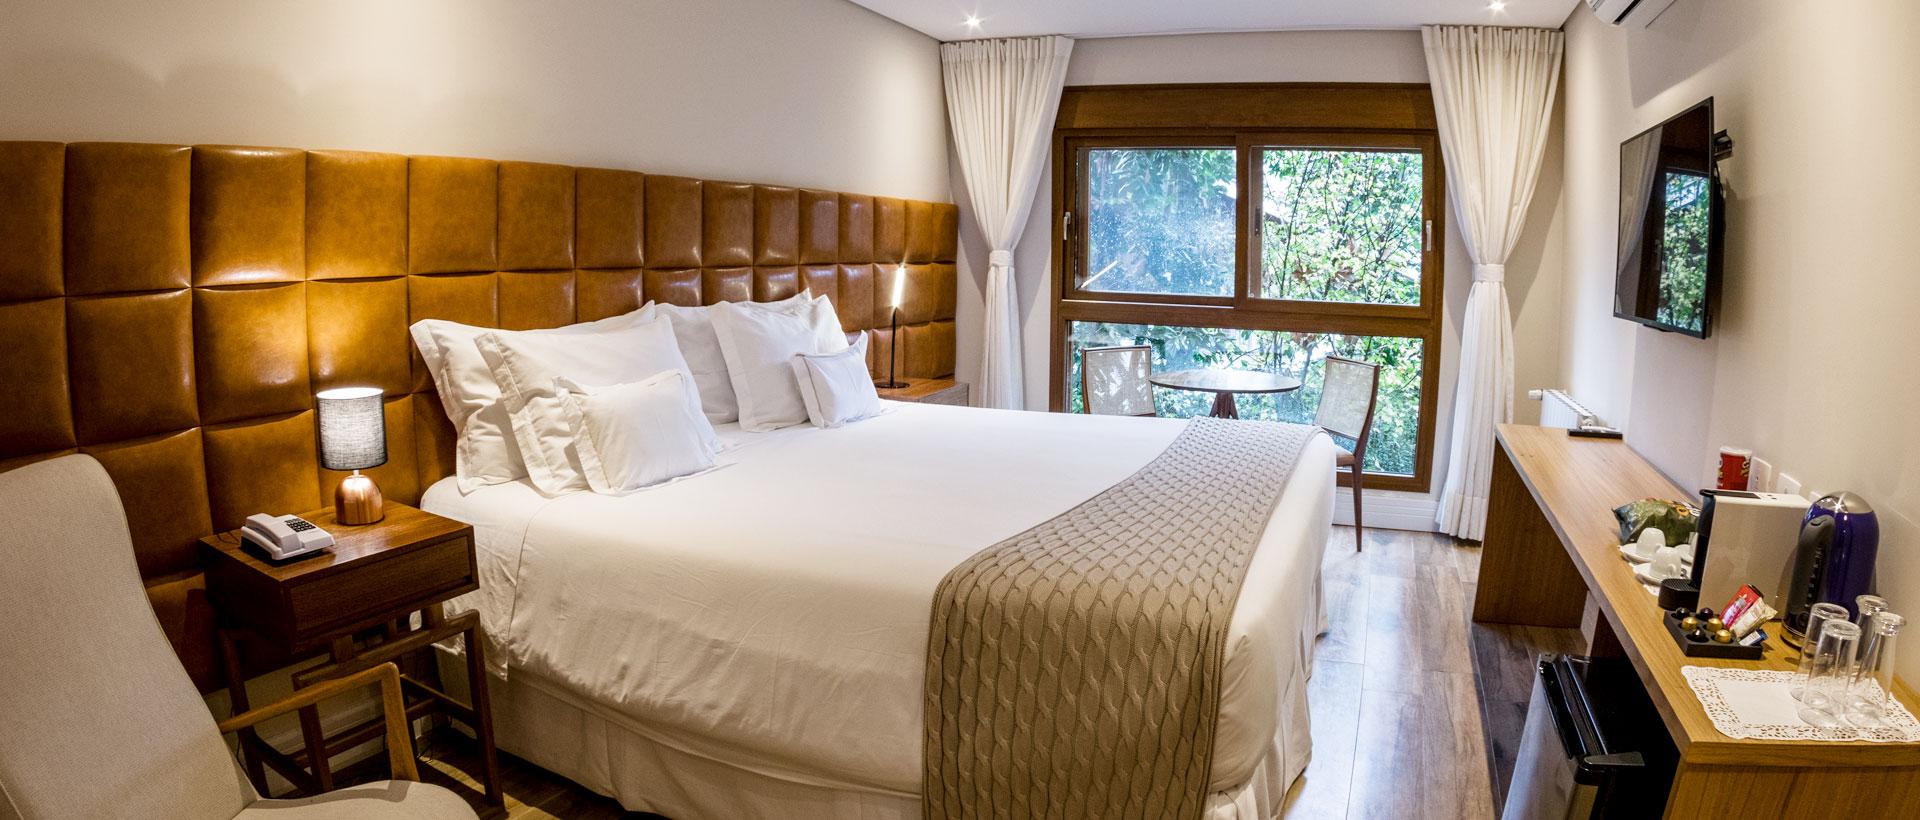 platanus-hotel-boutique-quebra-noz-conforto-e-natureza3